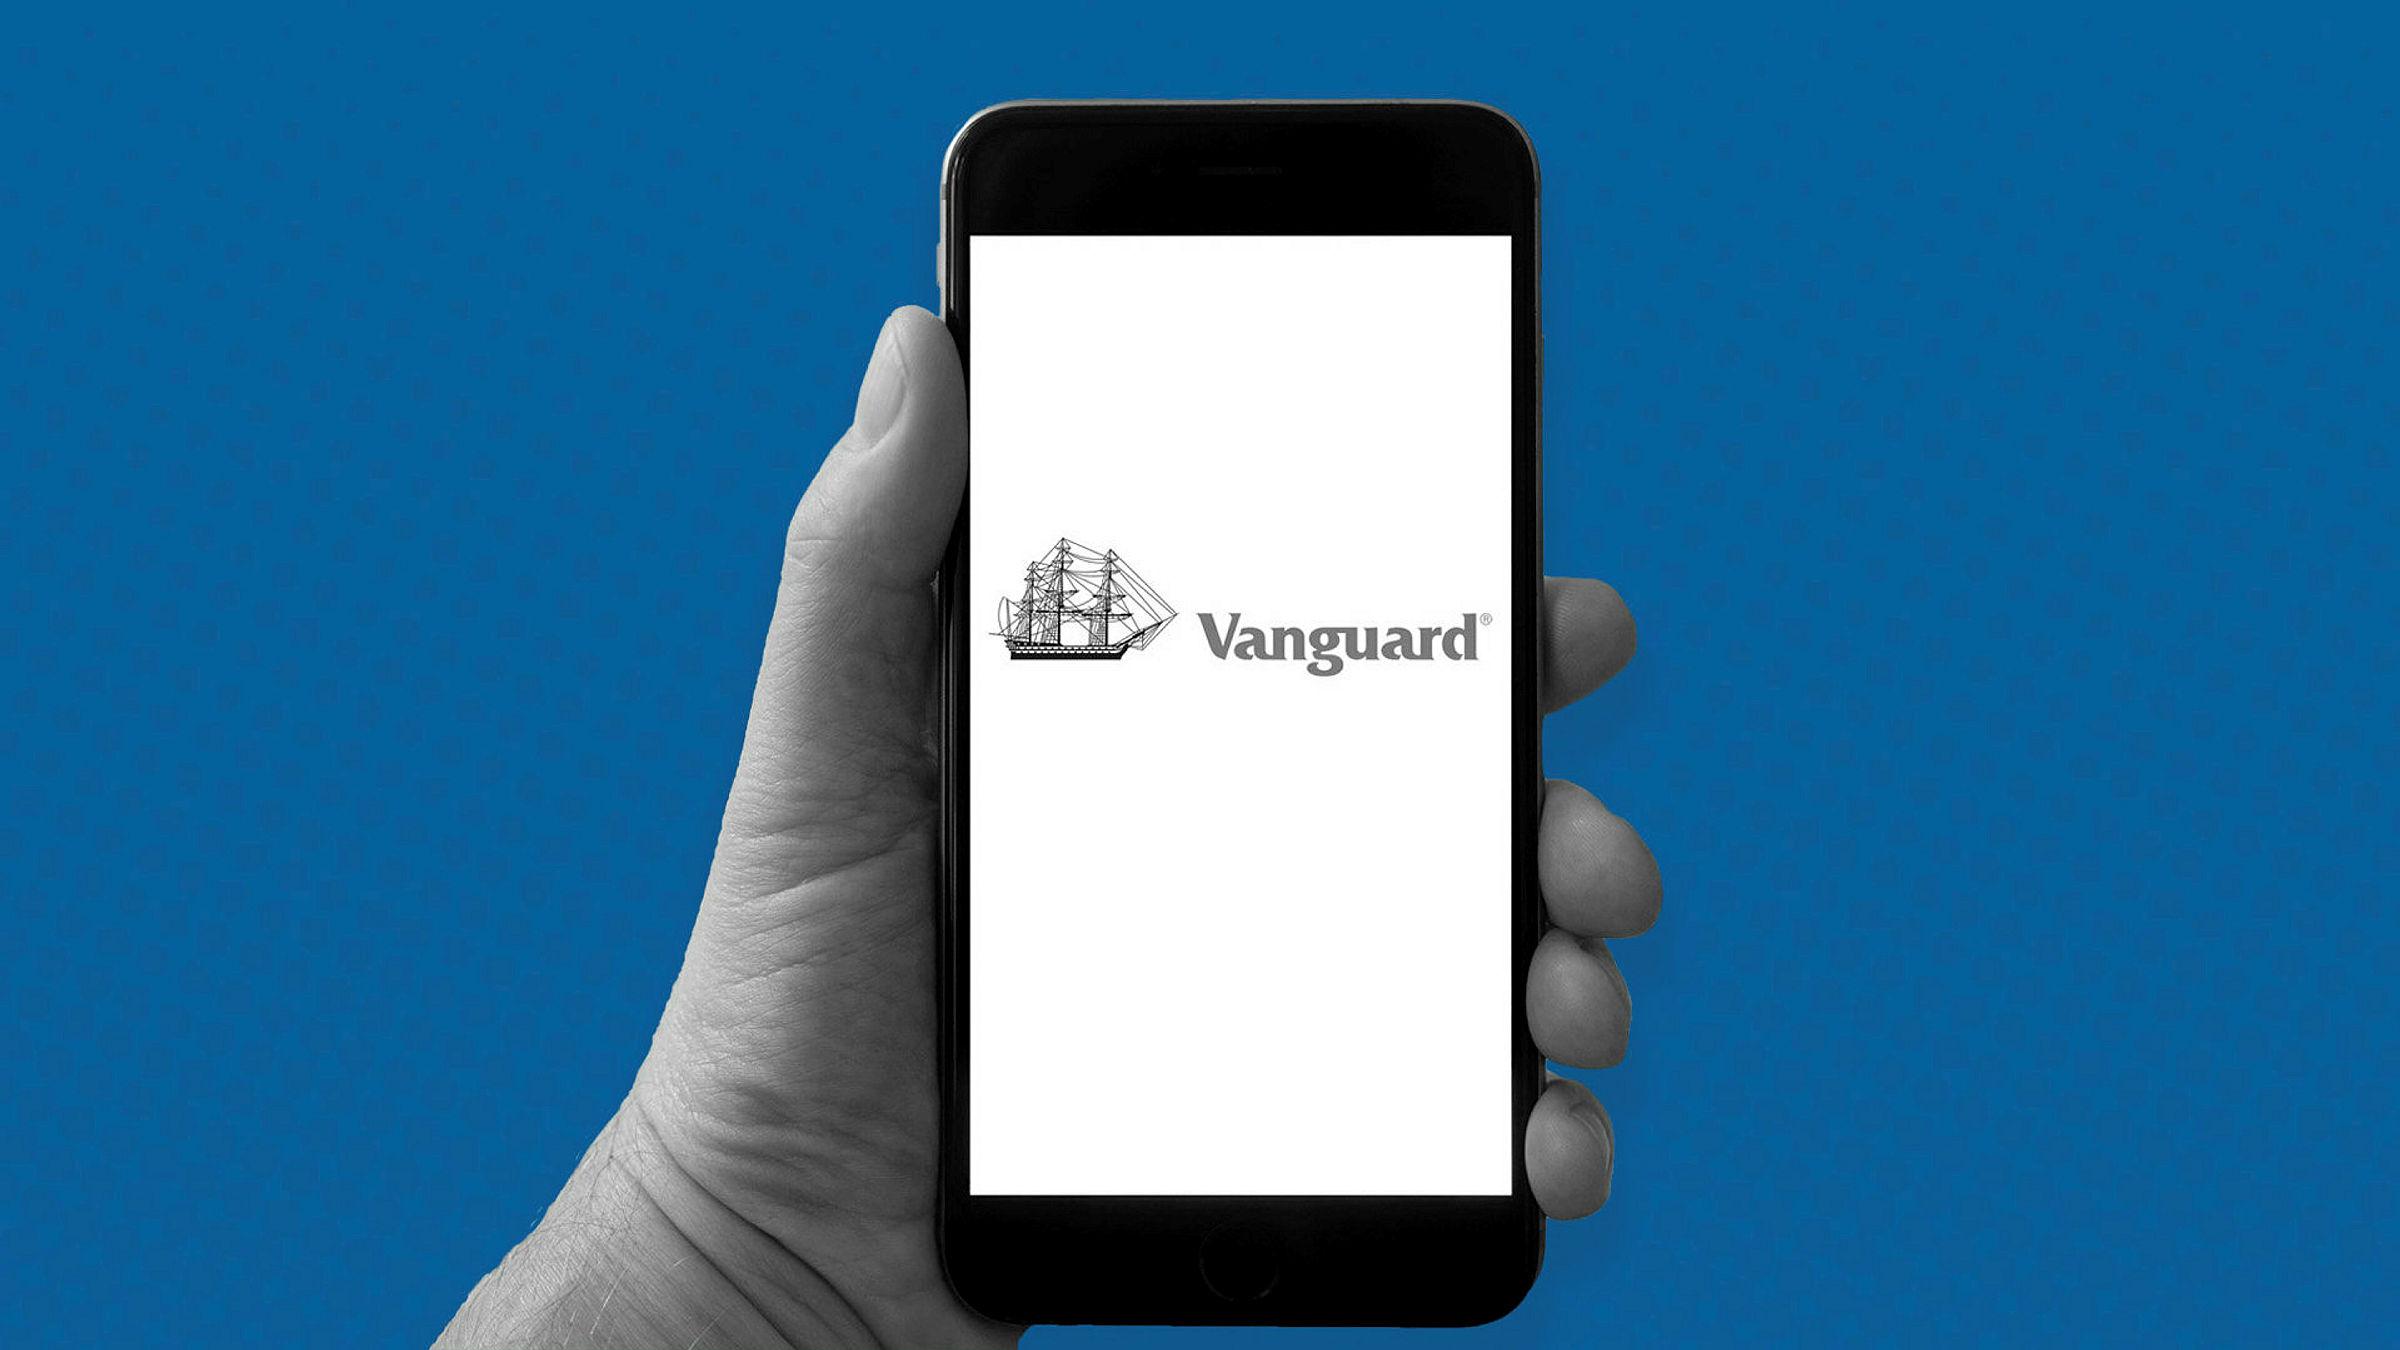 vanguard lifestrategy rivals compared